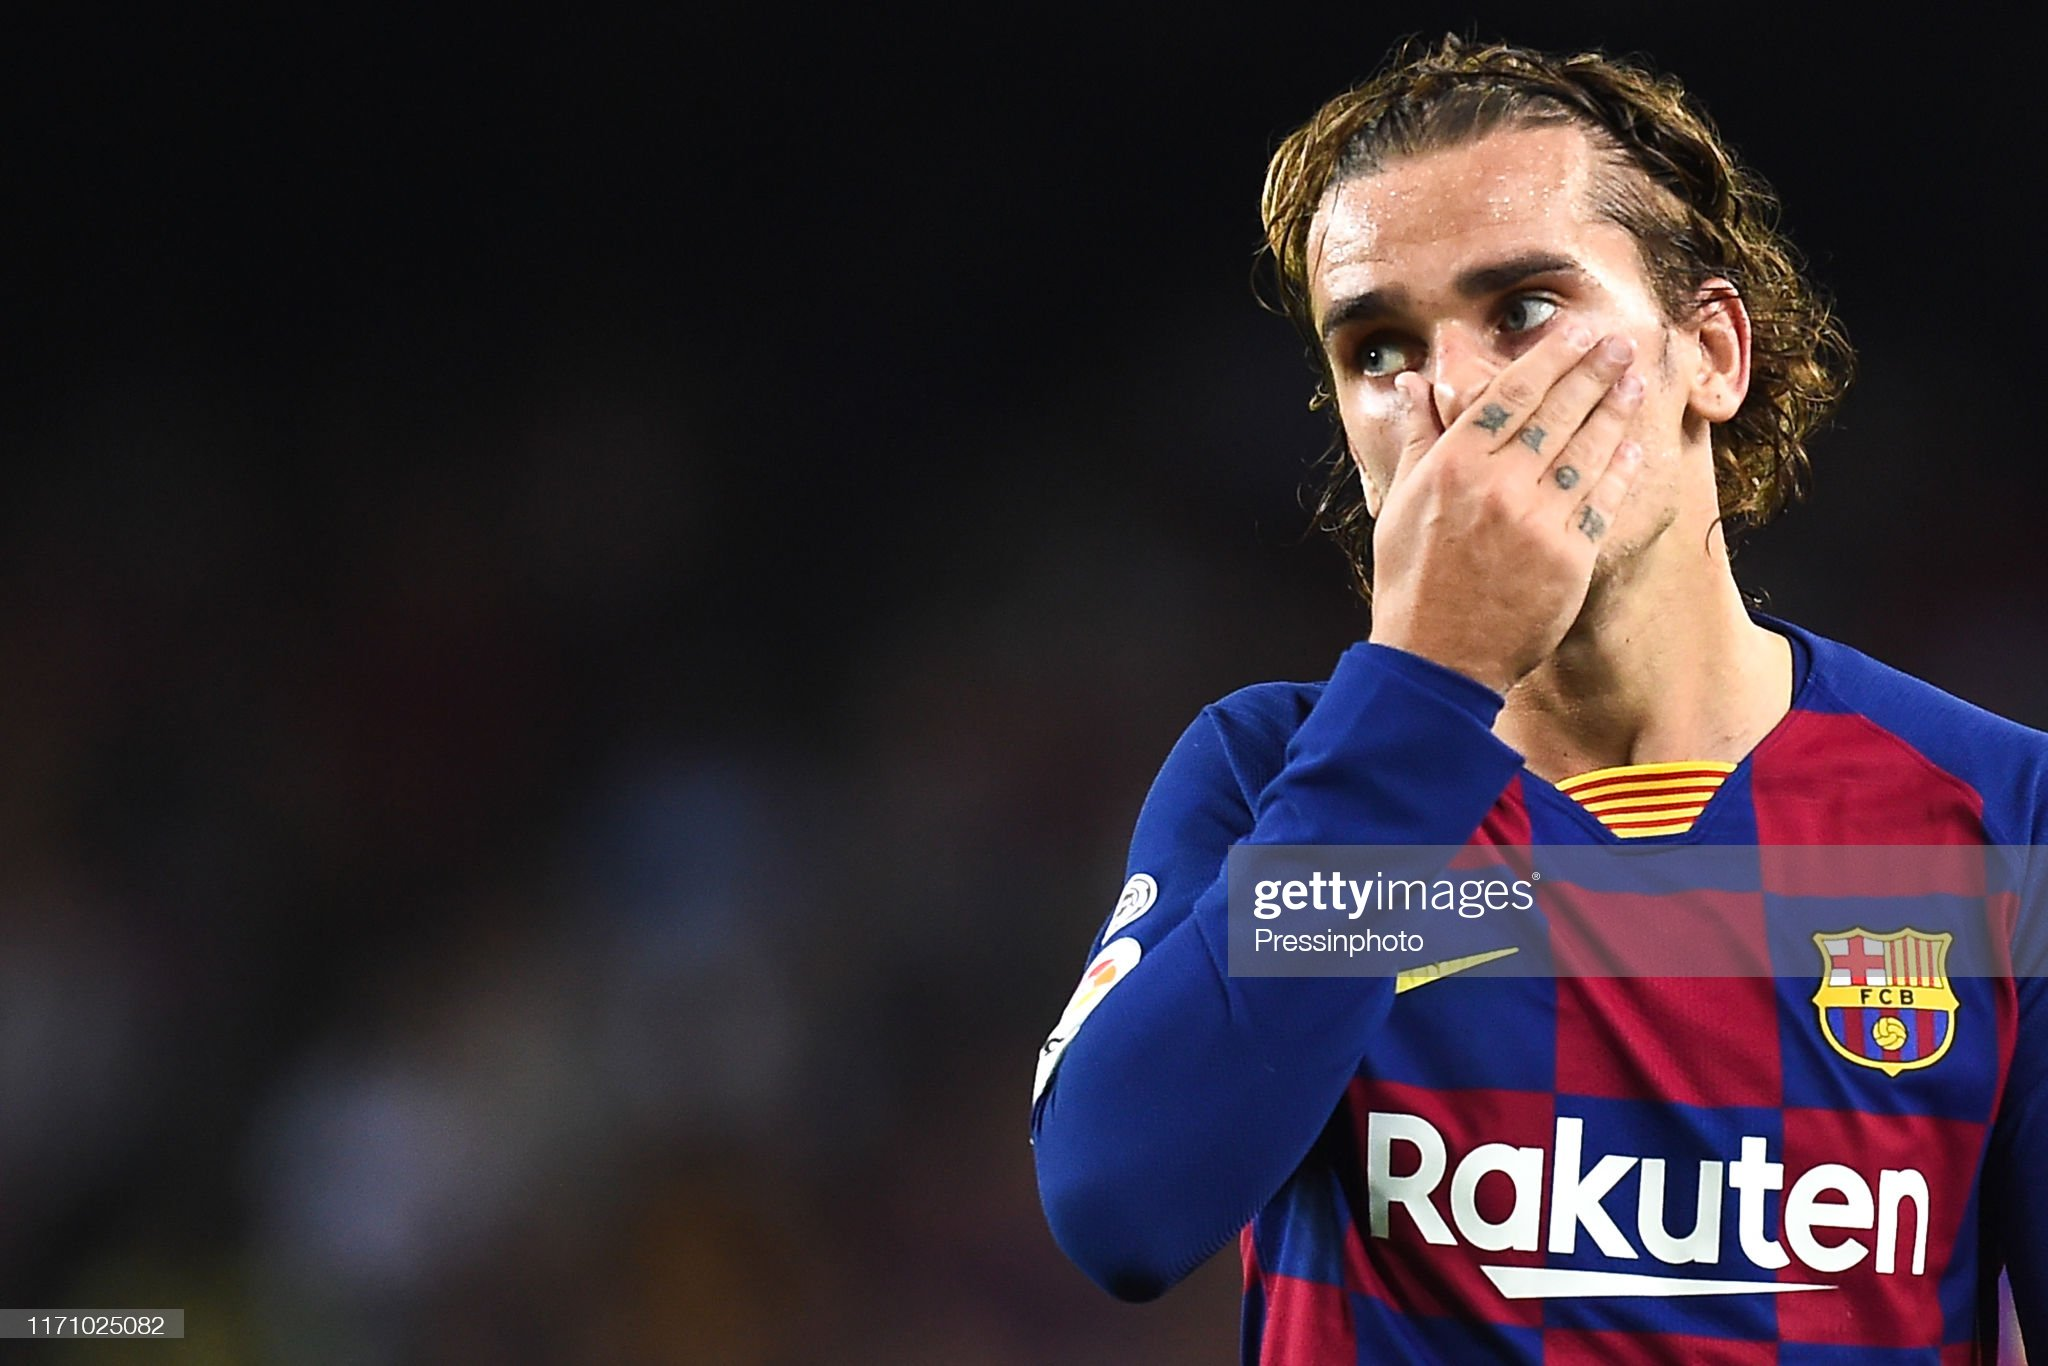 صور مباراة : برشلونة - فياريال 2-1 ( 24-09-2019 )  Antoine-griezmann-of-fc-barcelona-during-the-liga-match-between-and-picture-id1171025082?s=2048x2048